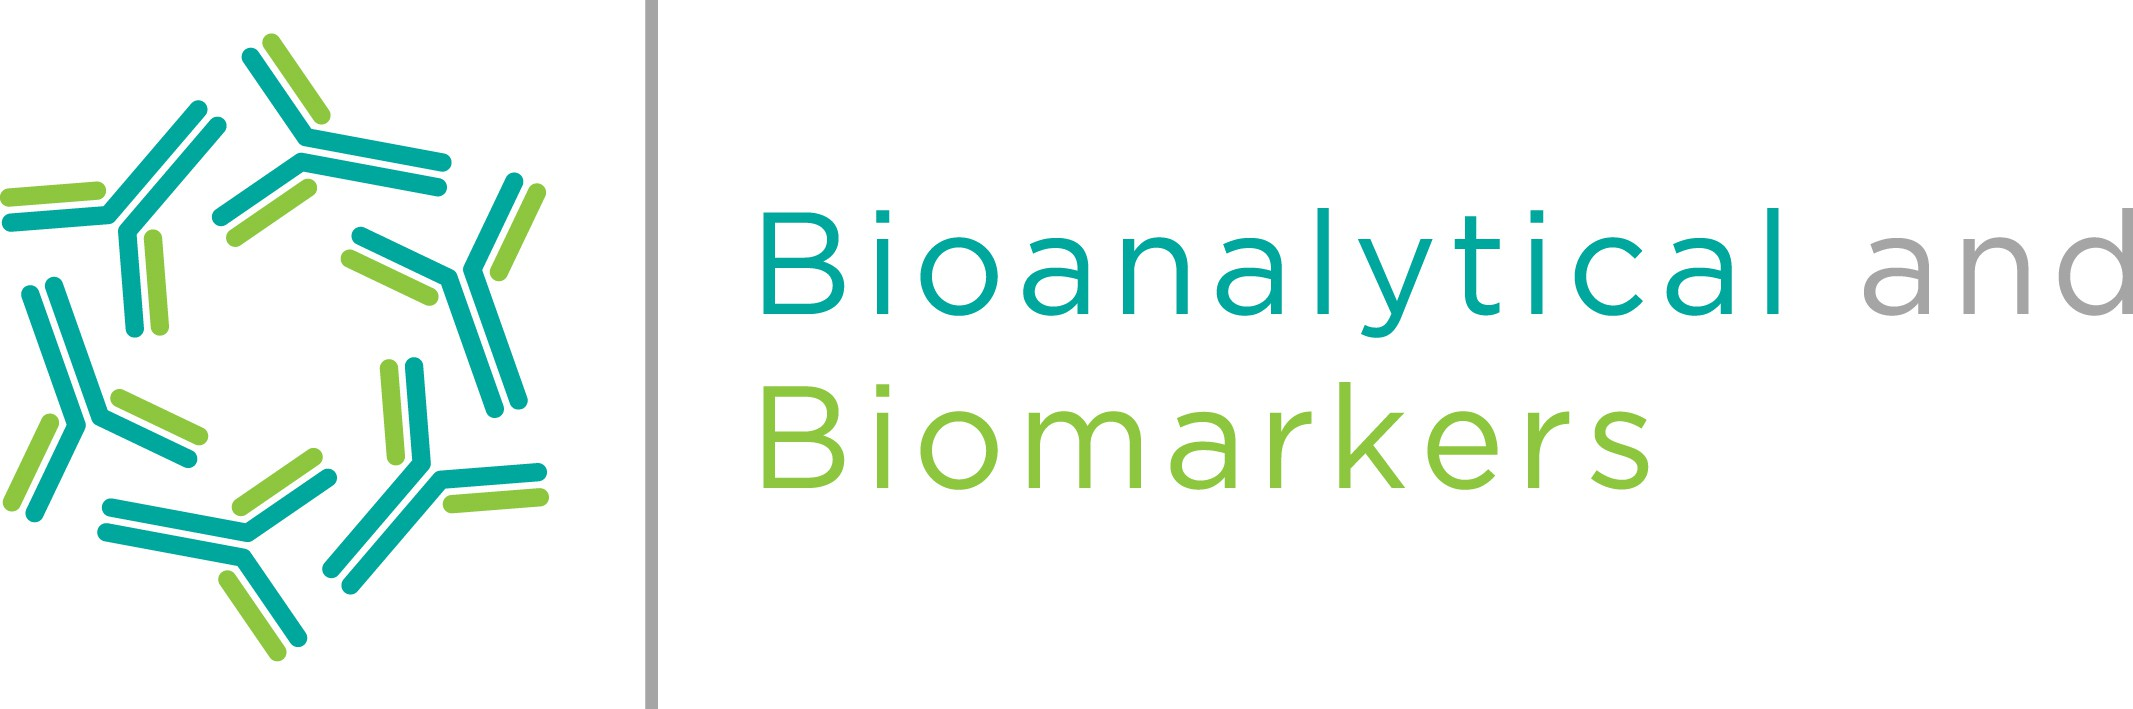 Bioanalytical and Biomarkers Logo Design